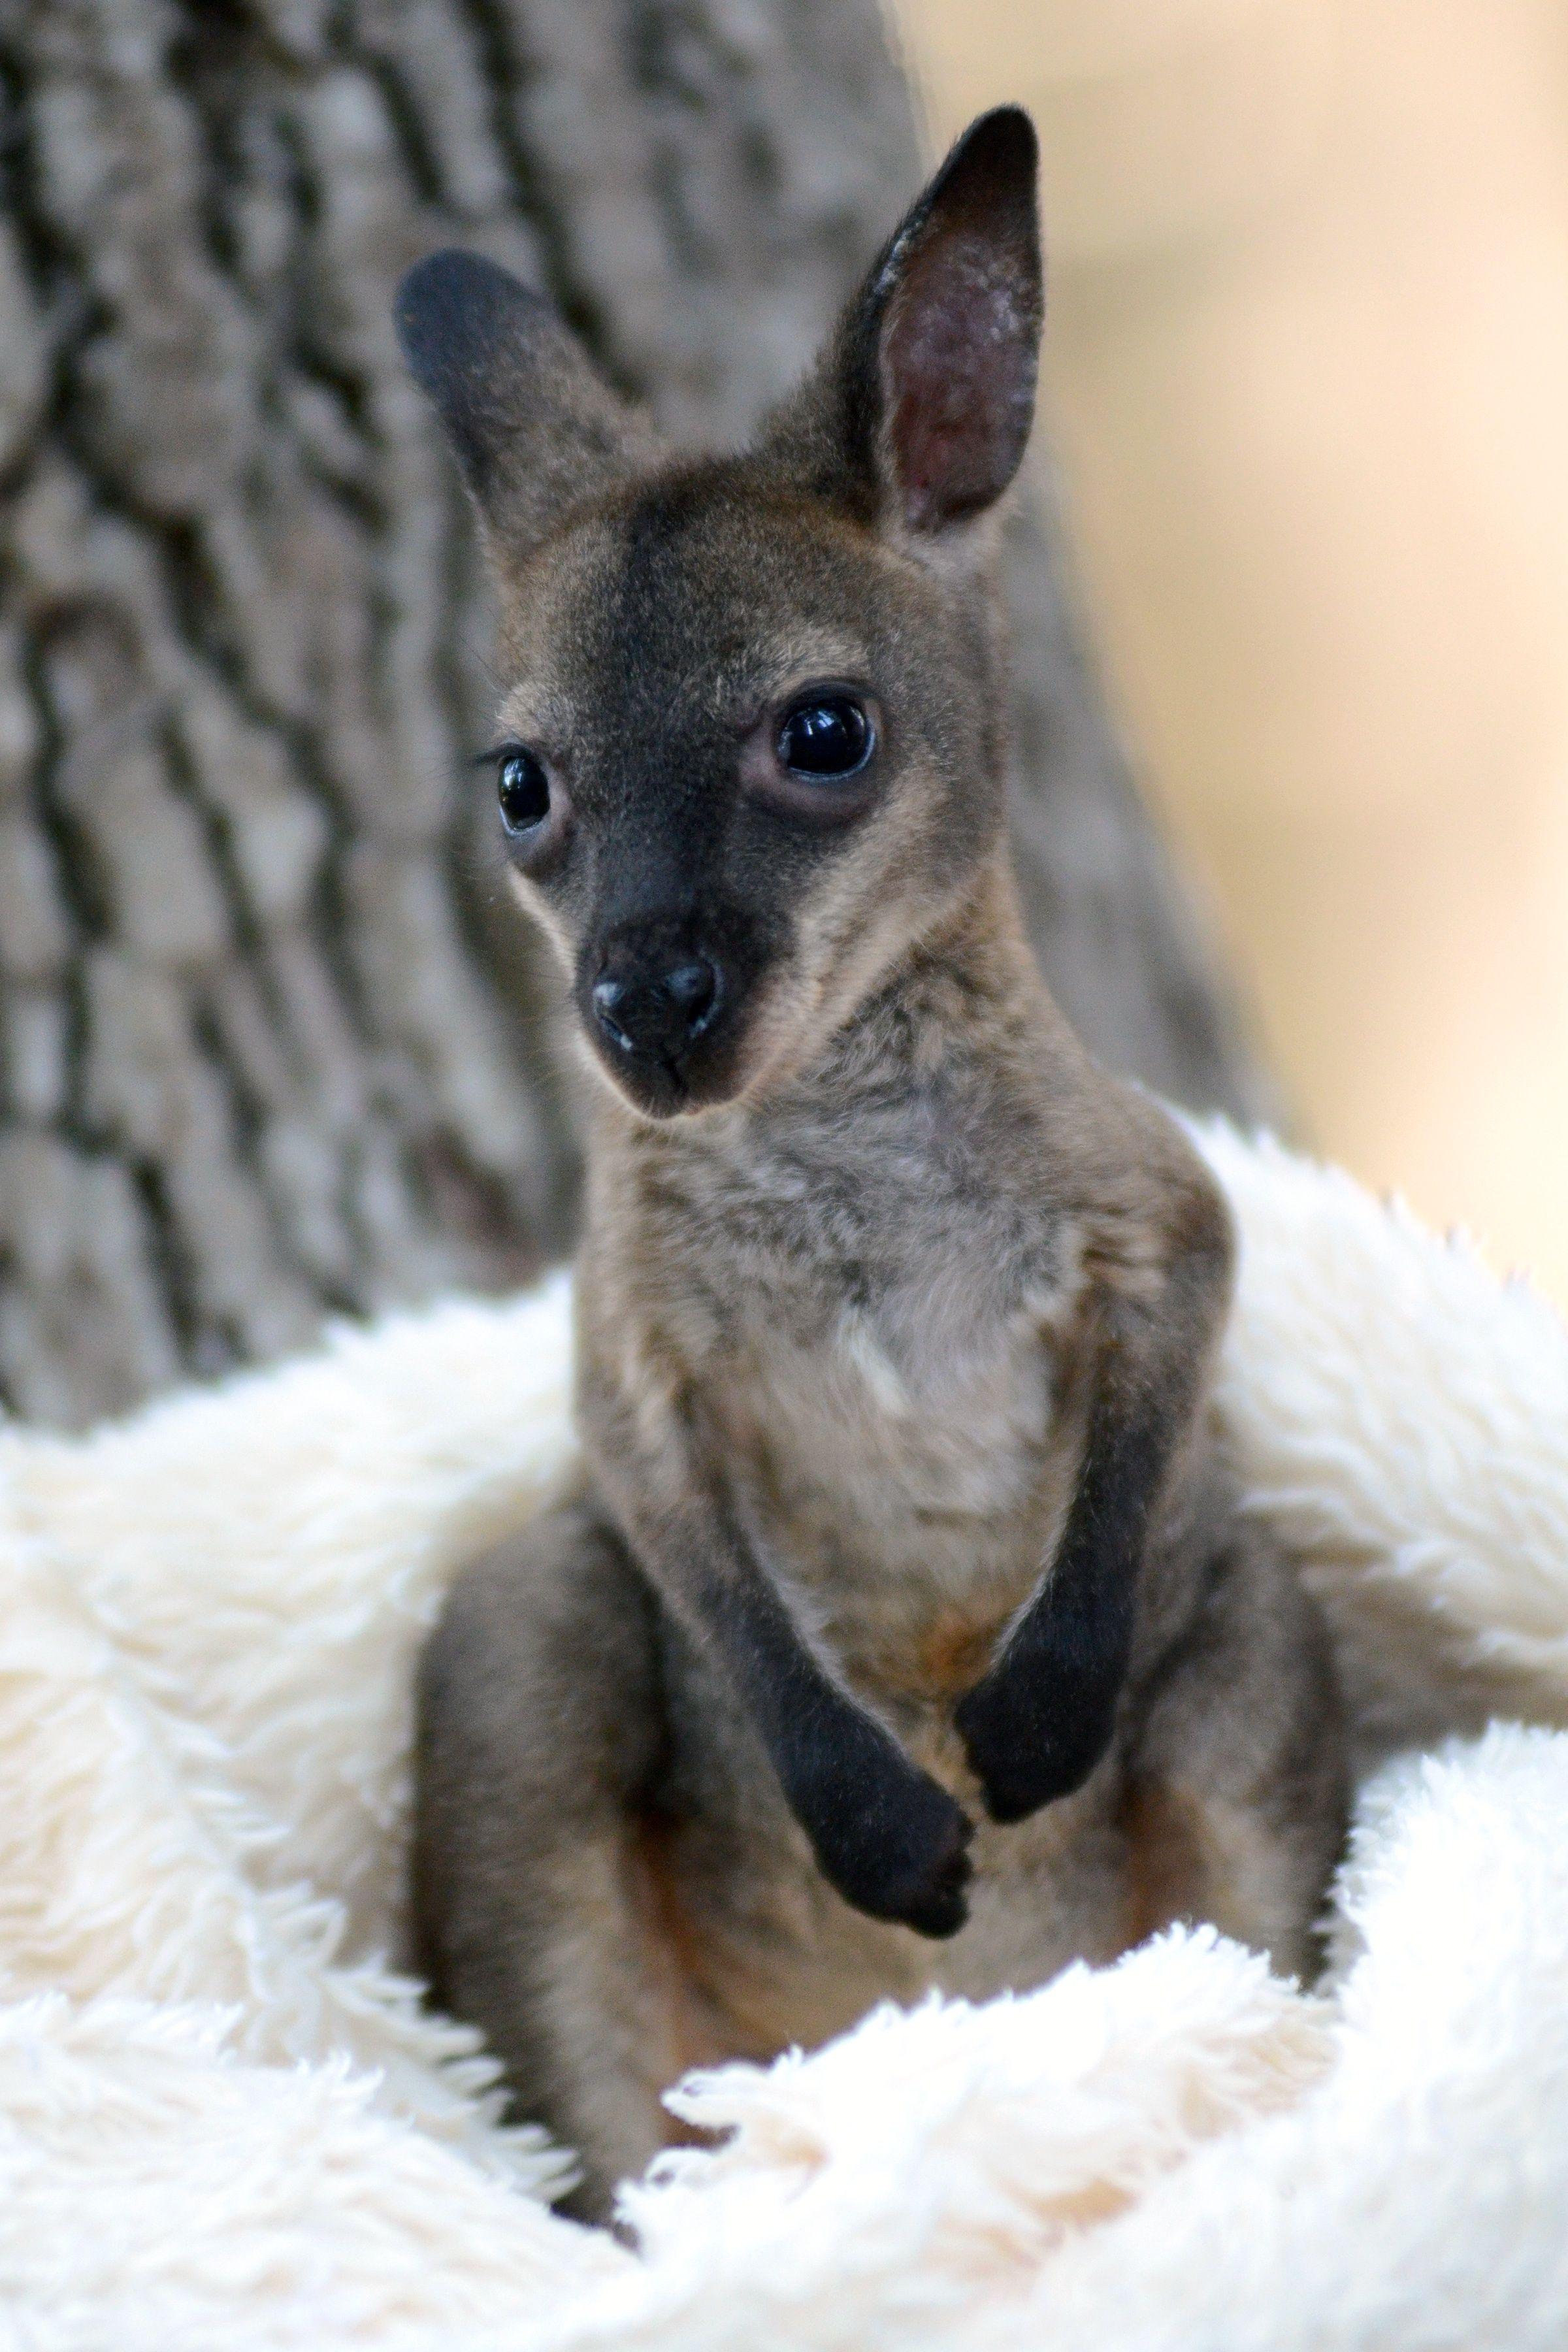 Cute baby wallaby at seaworld san antonio cute animals